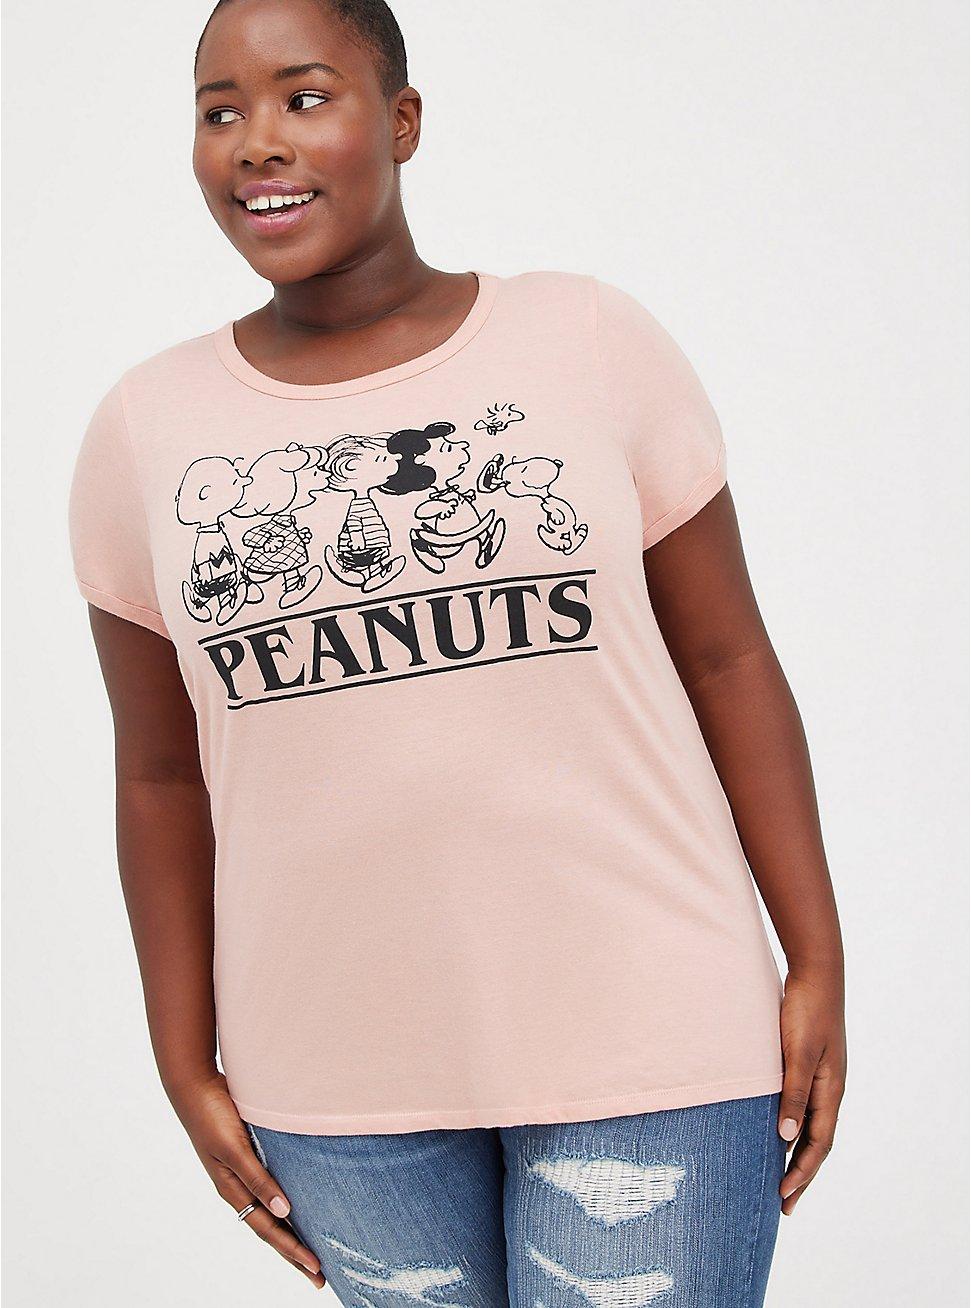 Classic Fit Ringer Tee - Peanuts Blush, BLUSH, hi-res